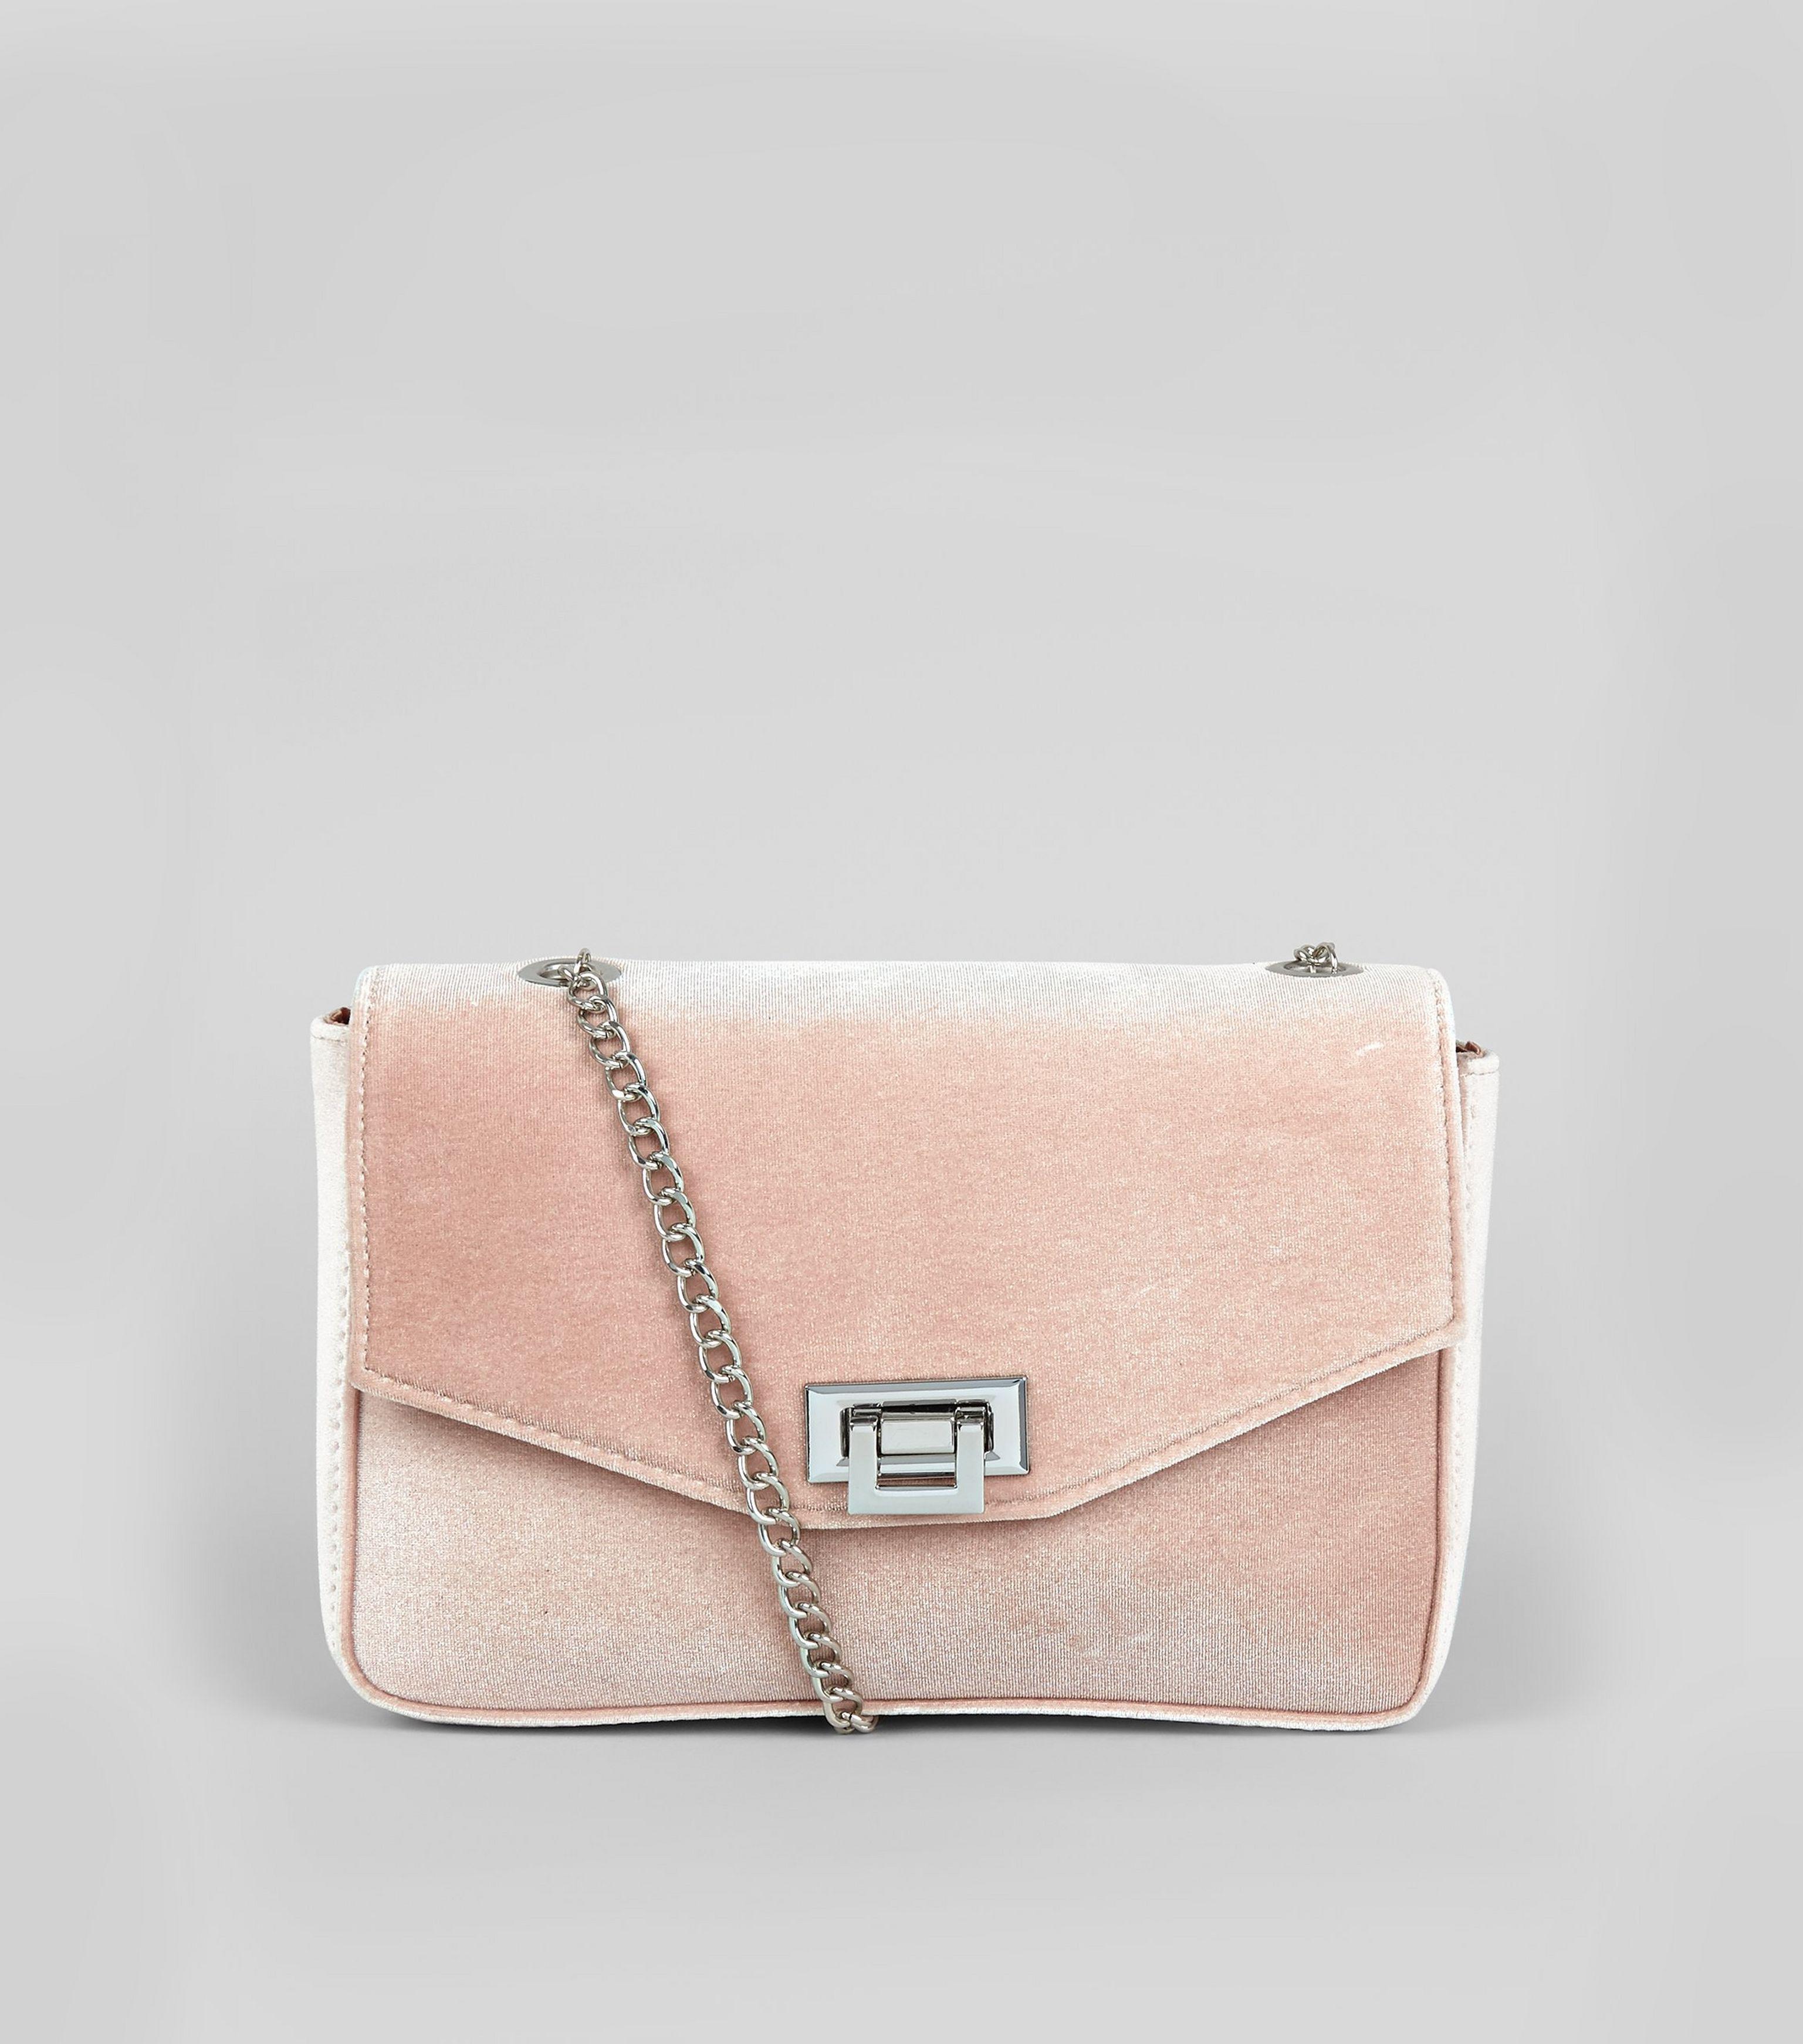 New Look Pink Velvet Lock Front Shoulder Bag in Pink - Lyst ea02ae27f8